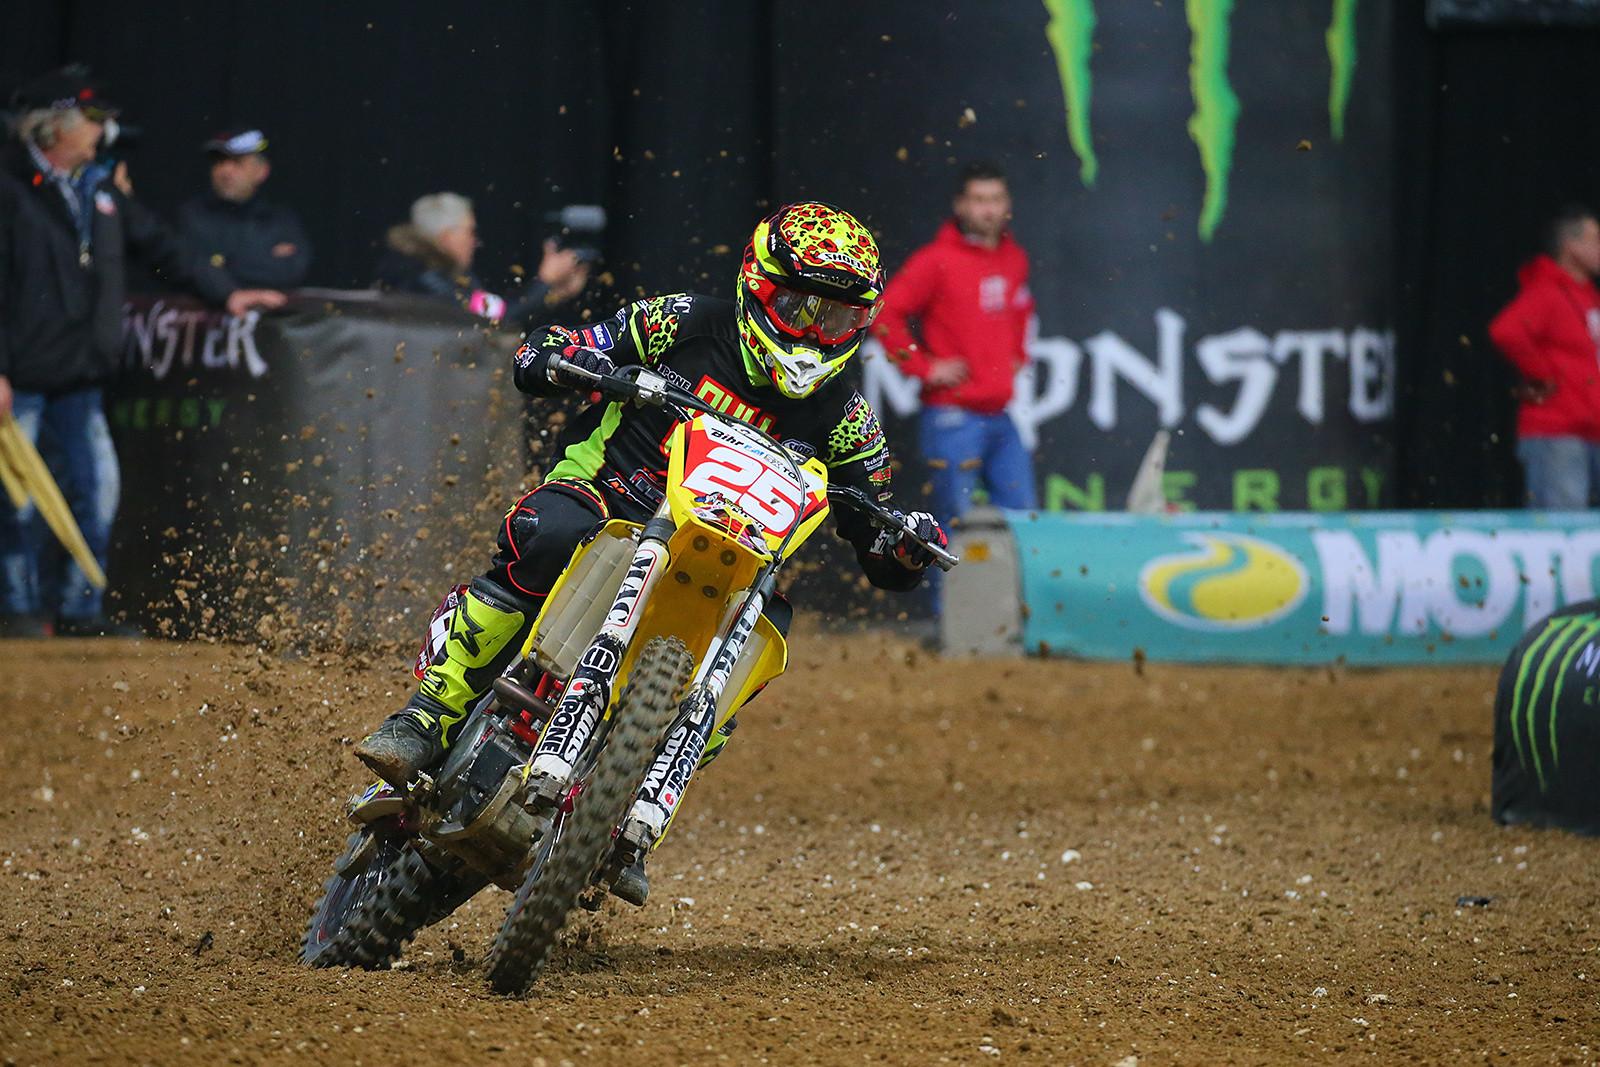 Florent Richier - Photo Gallery: Saturday at the Paris-Lille Supercross - Motocross Pictures - Vital MX